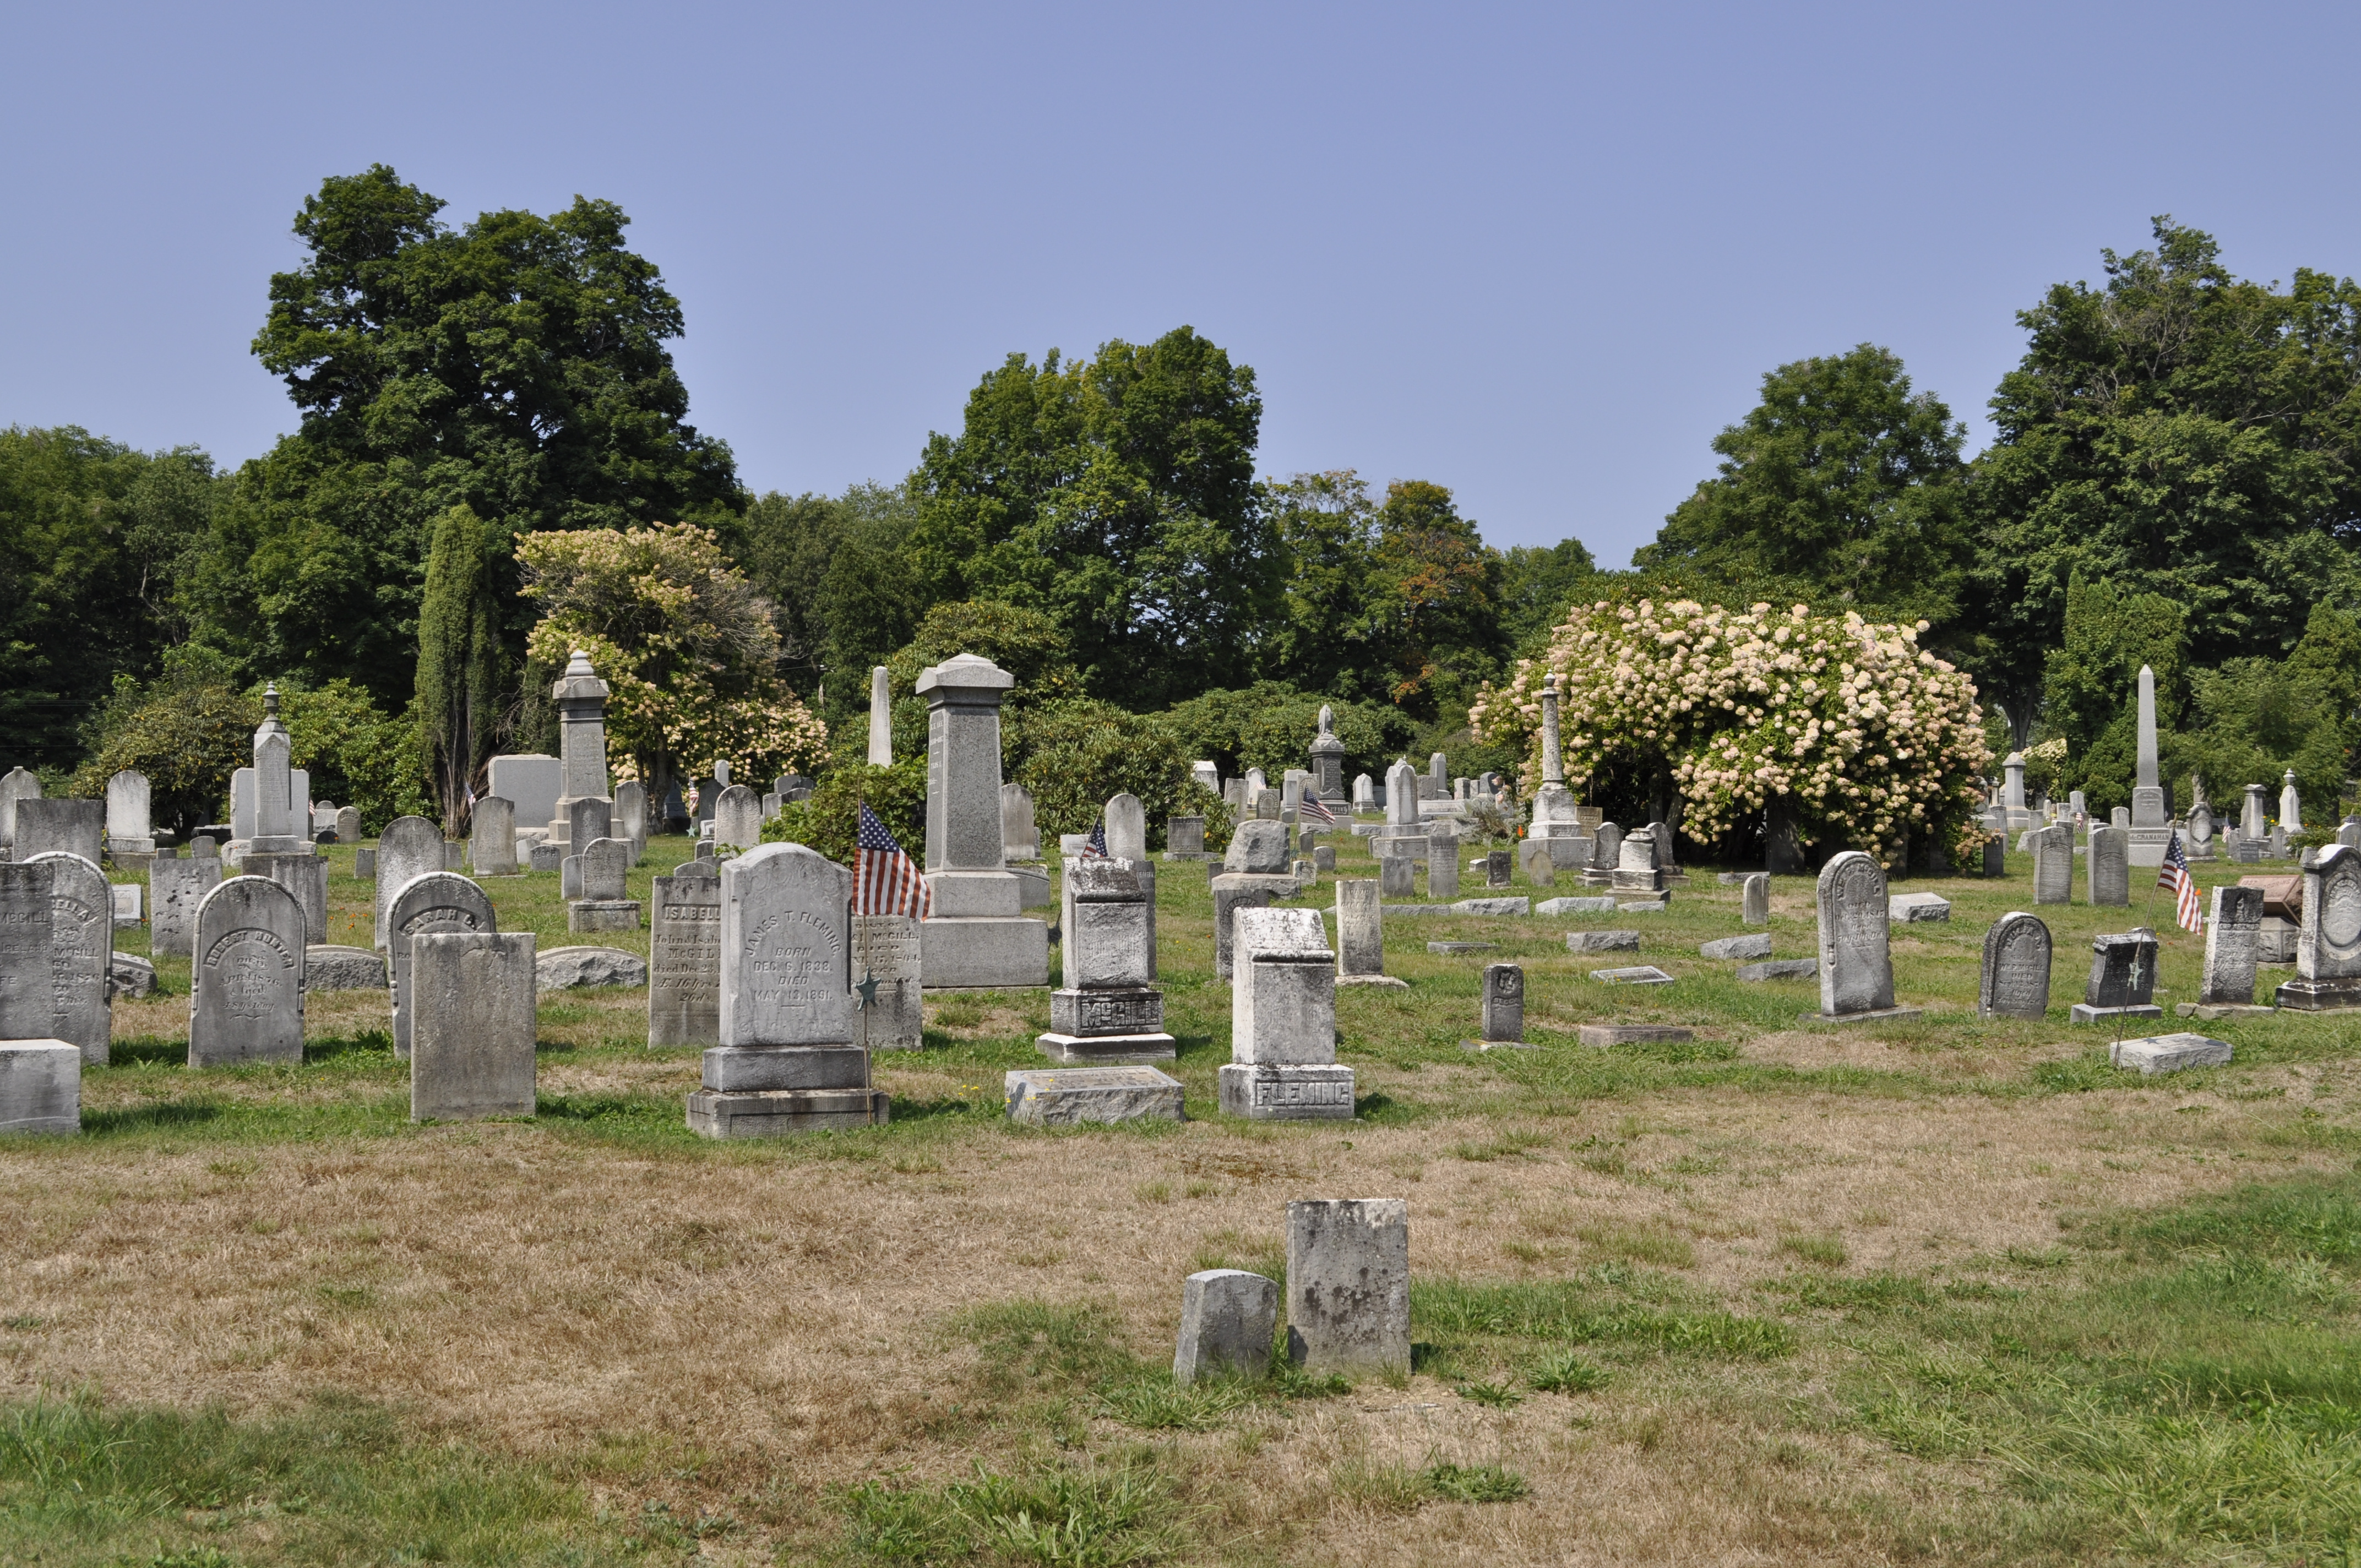 Saegertown Cemetery